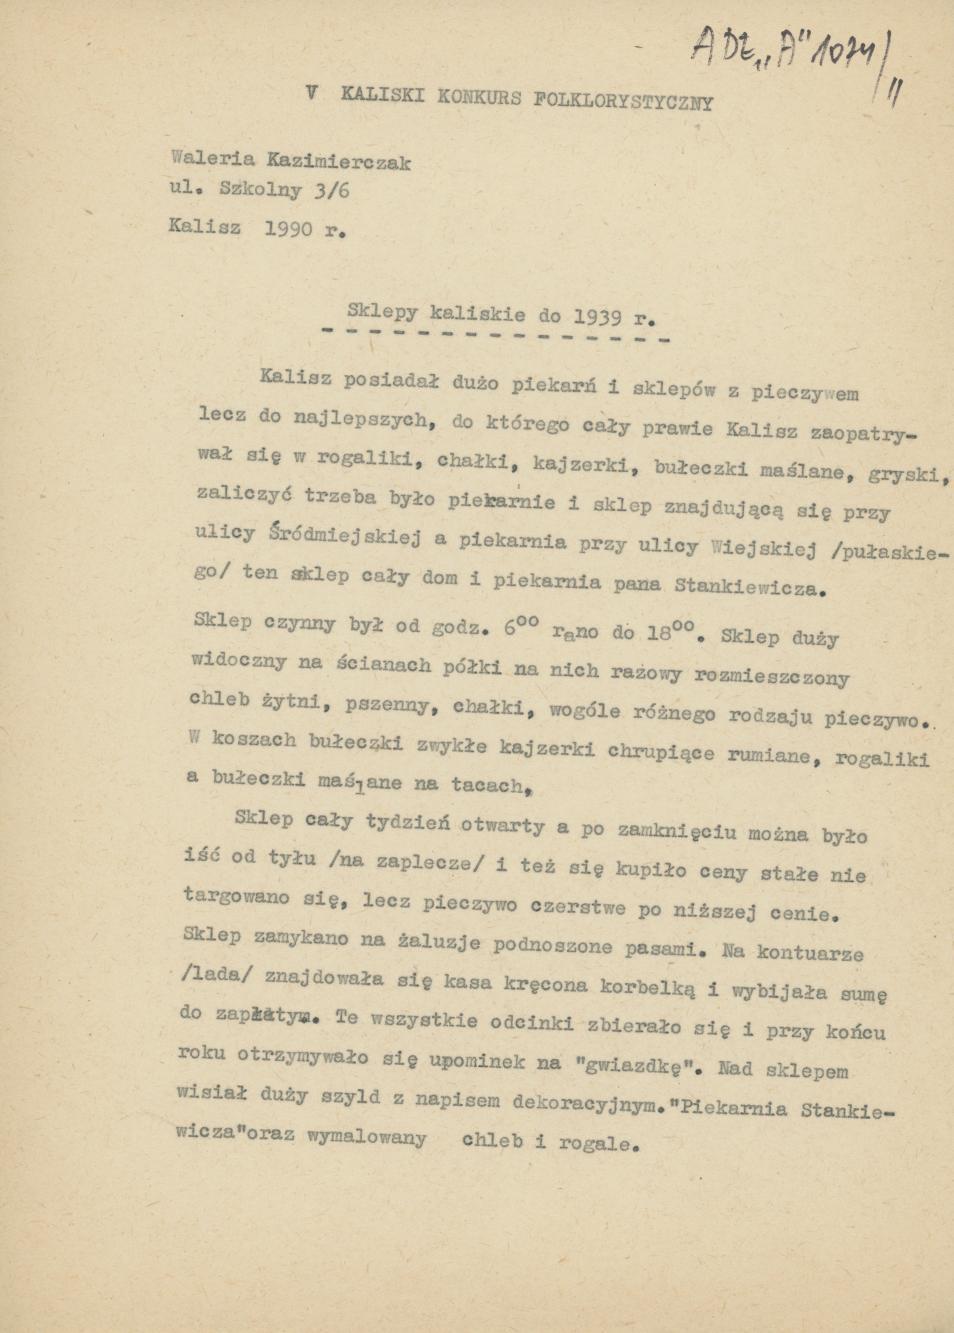 Sklepy kaliskie do 1939 r.